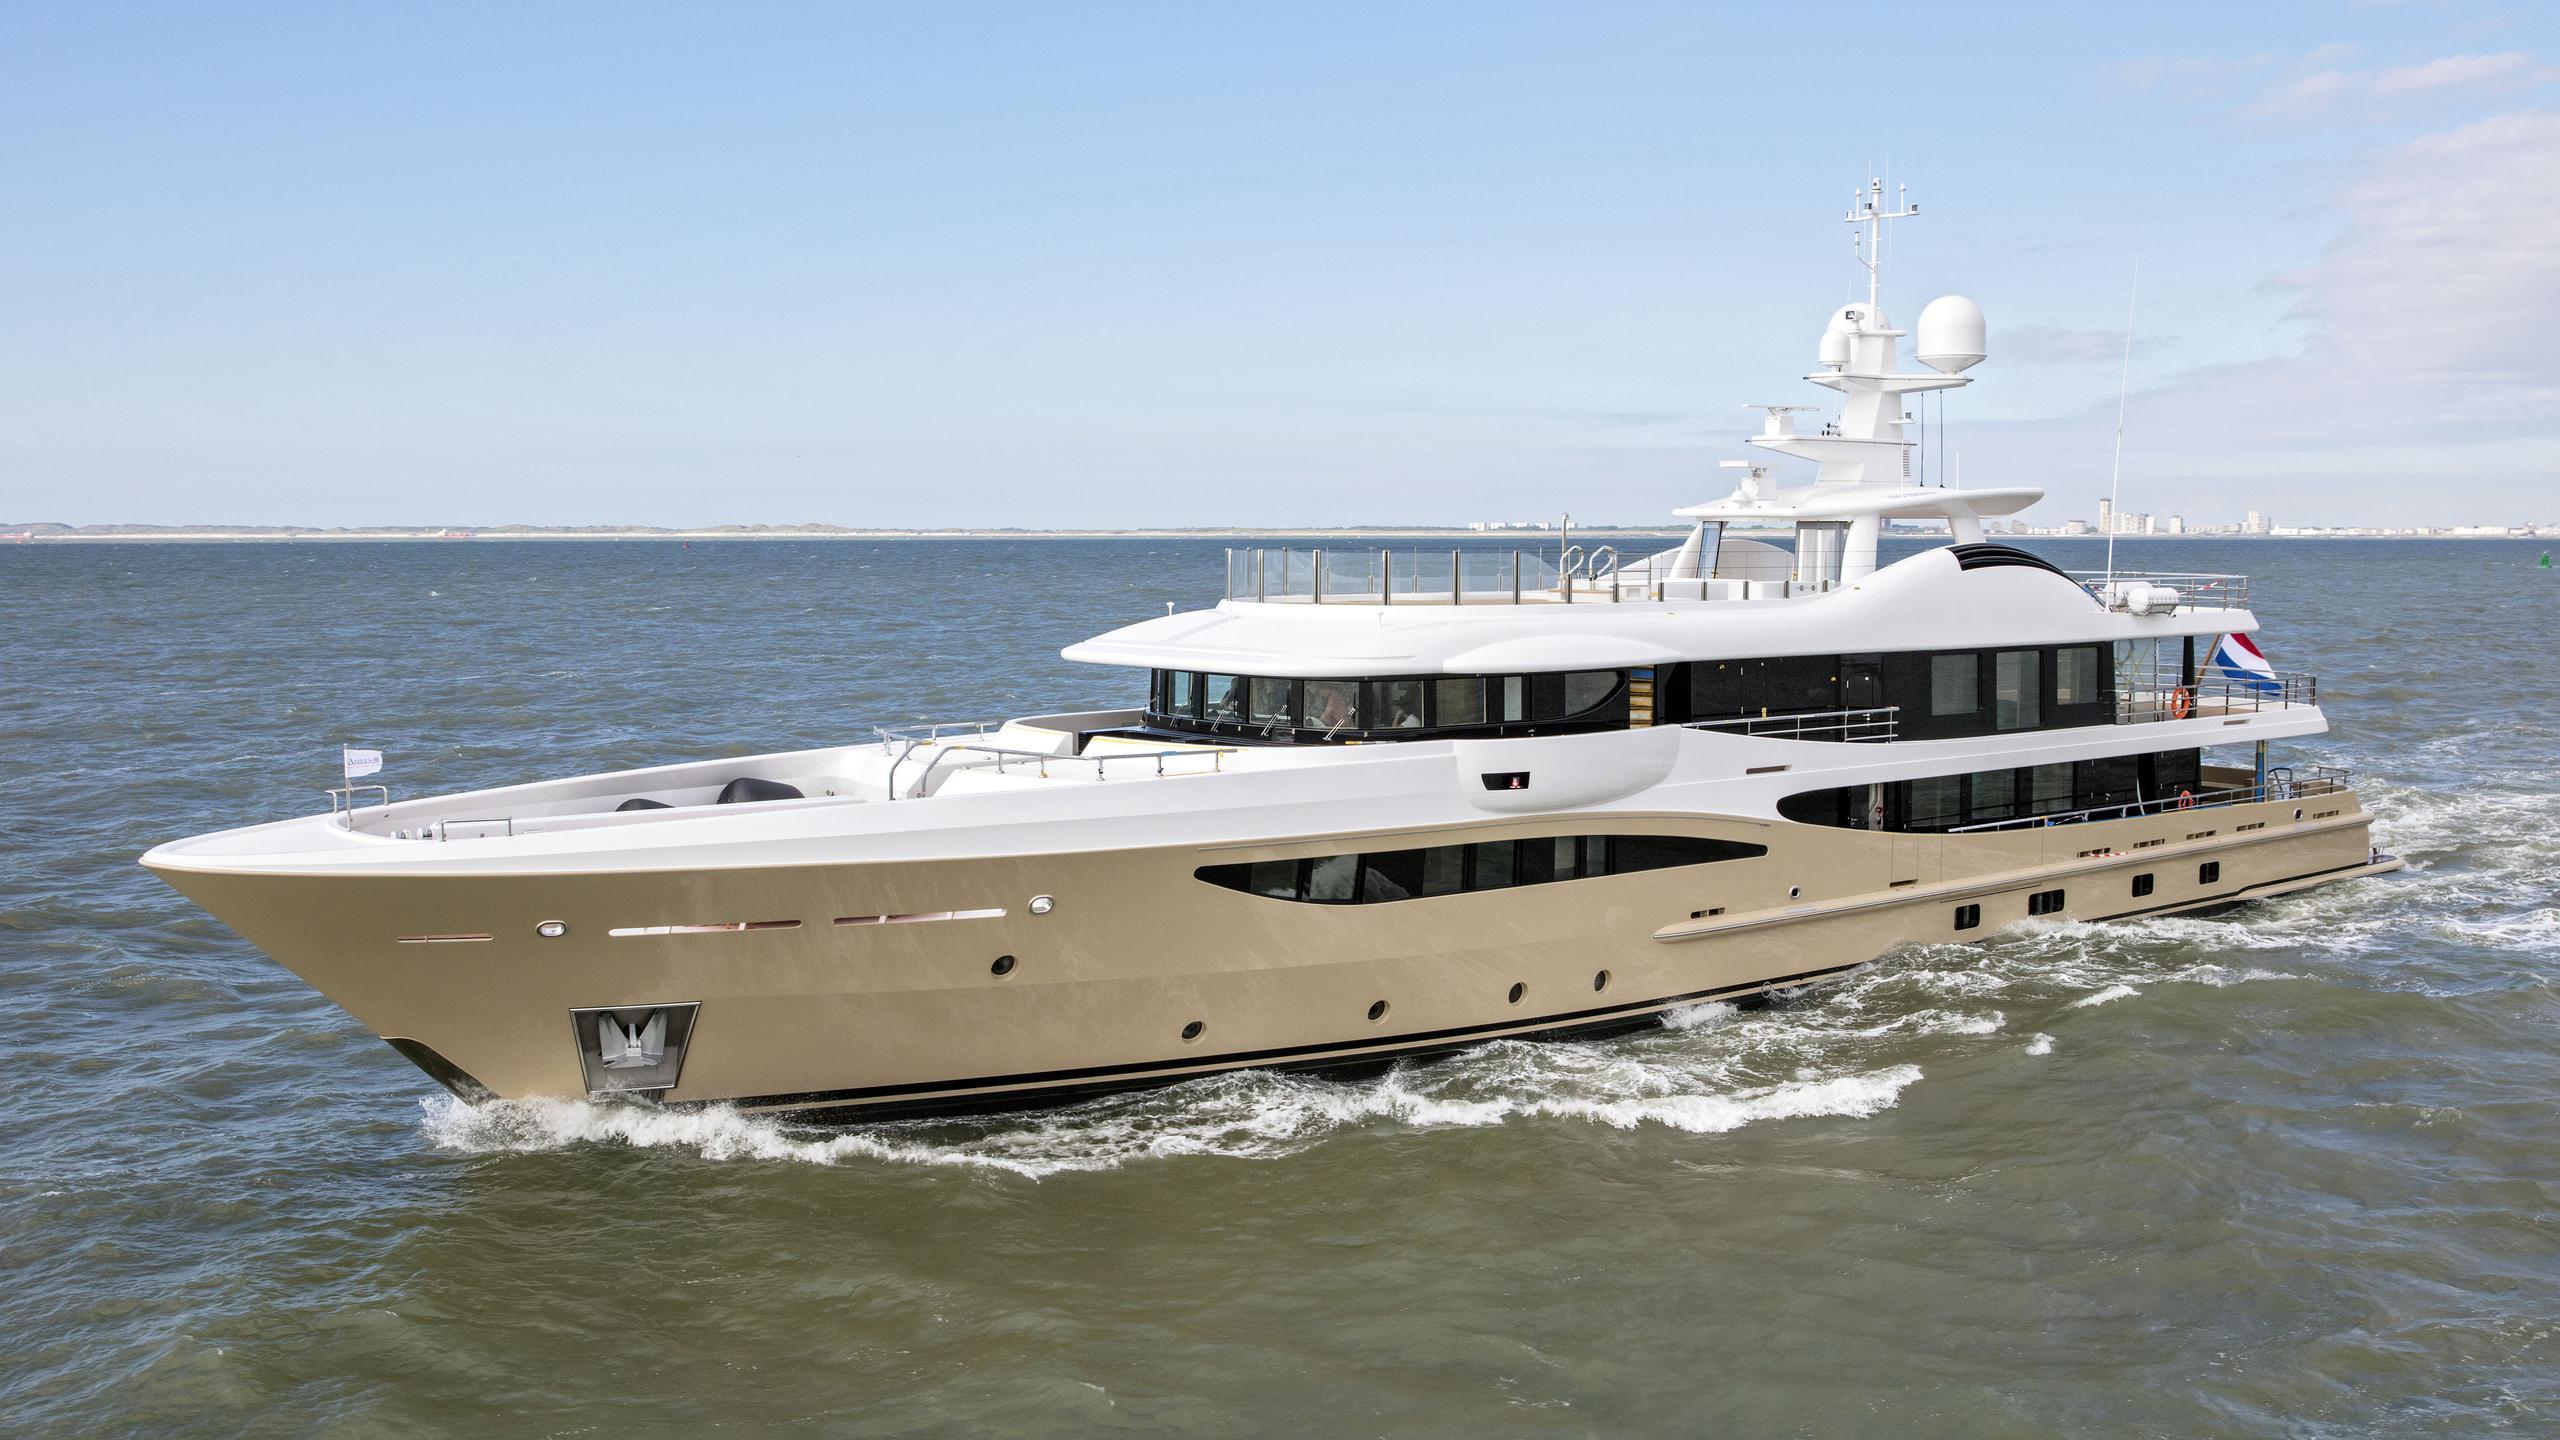 lili motoryacht amels le180 55m 2017 half profile